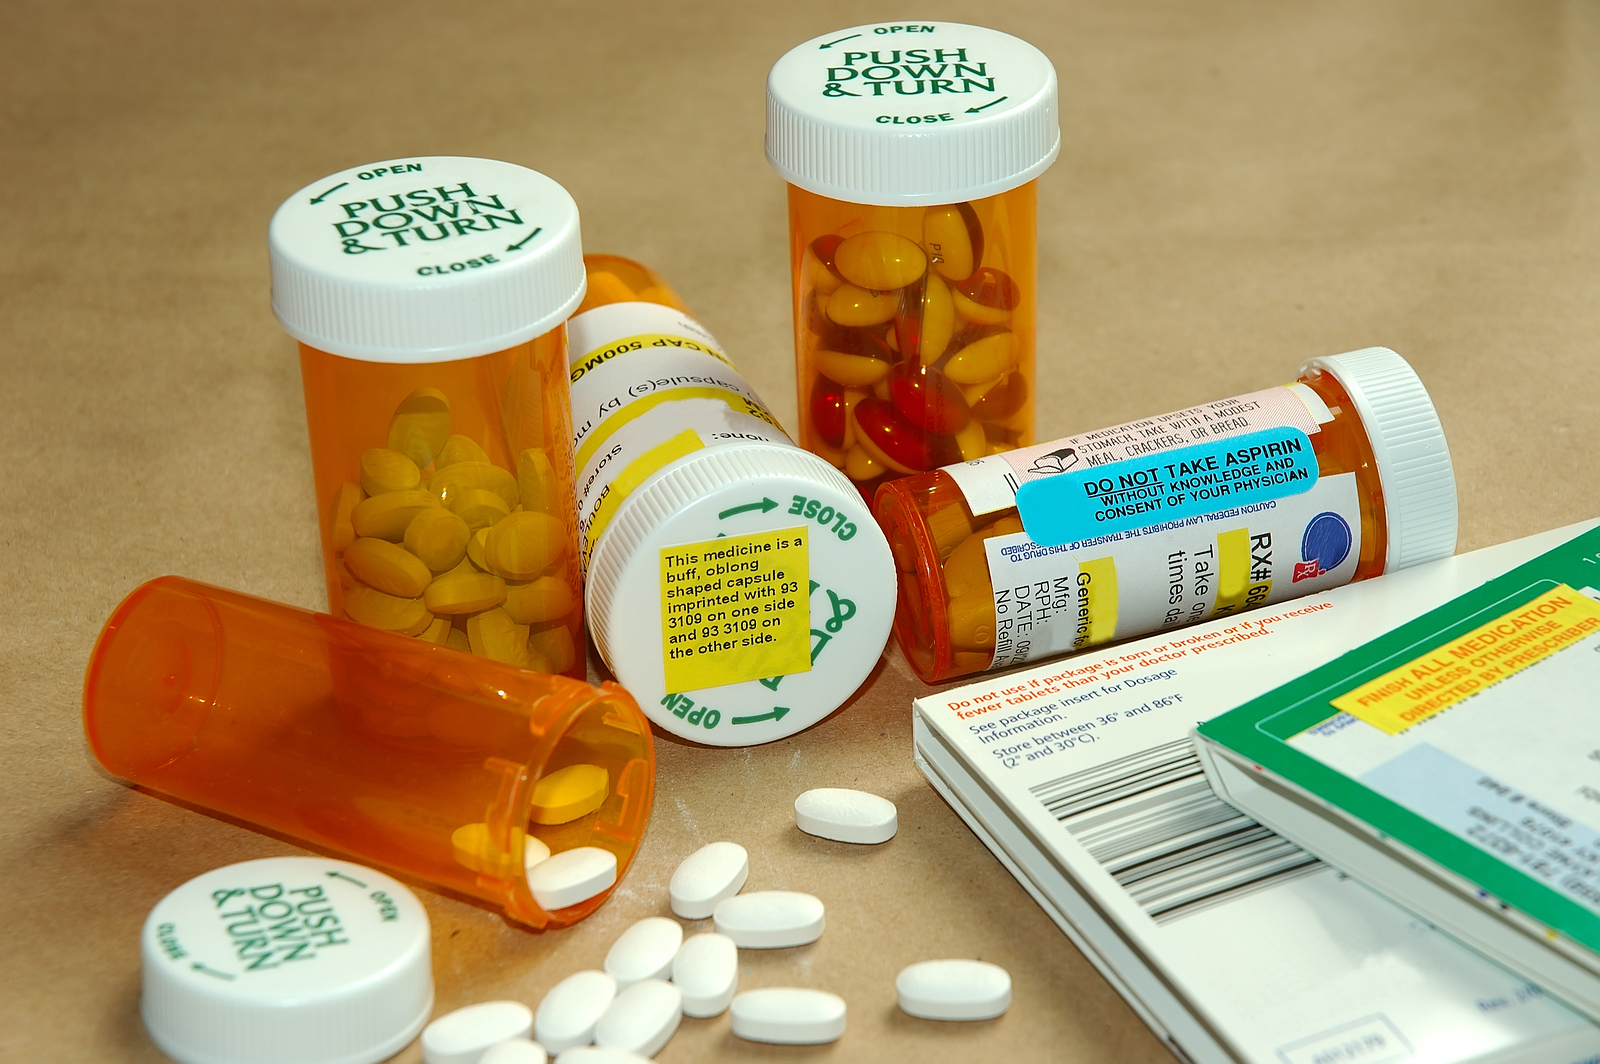 Sexual health and medicine